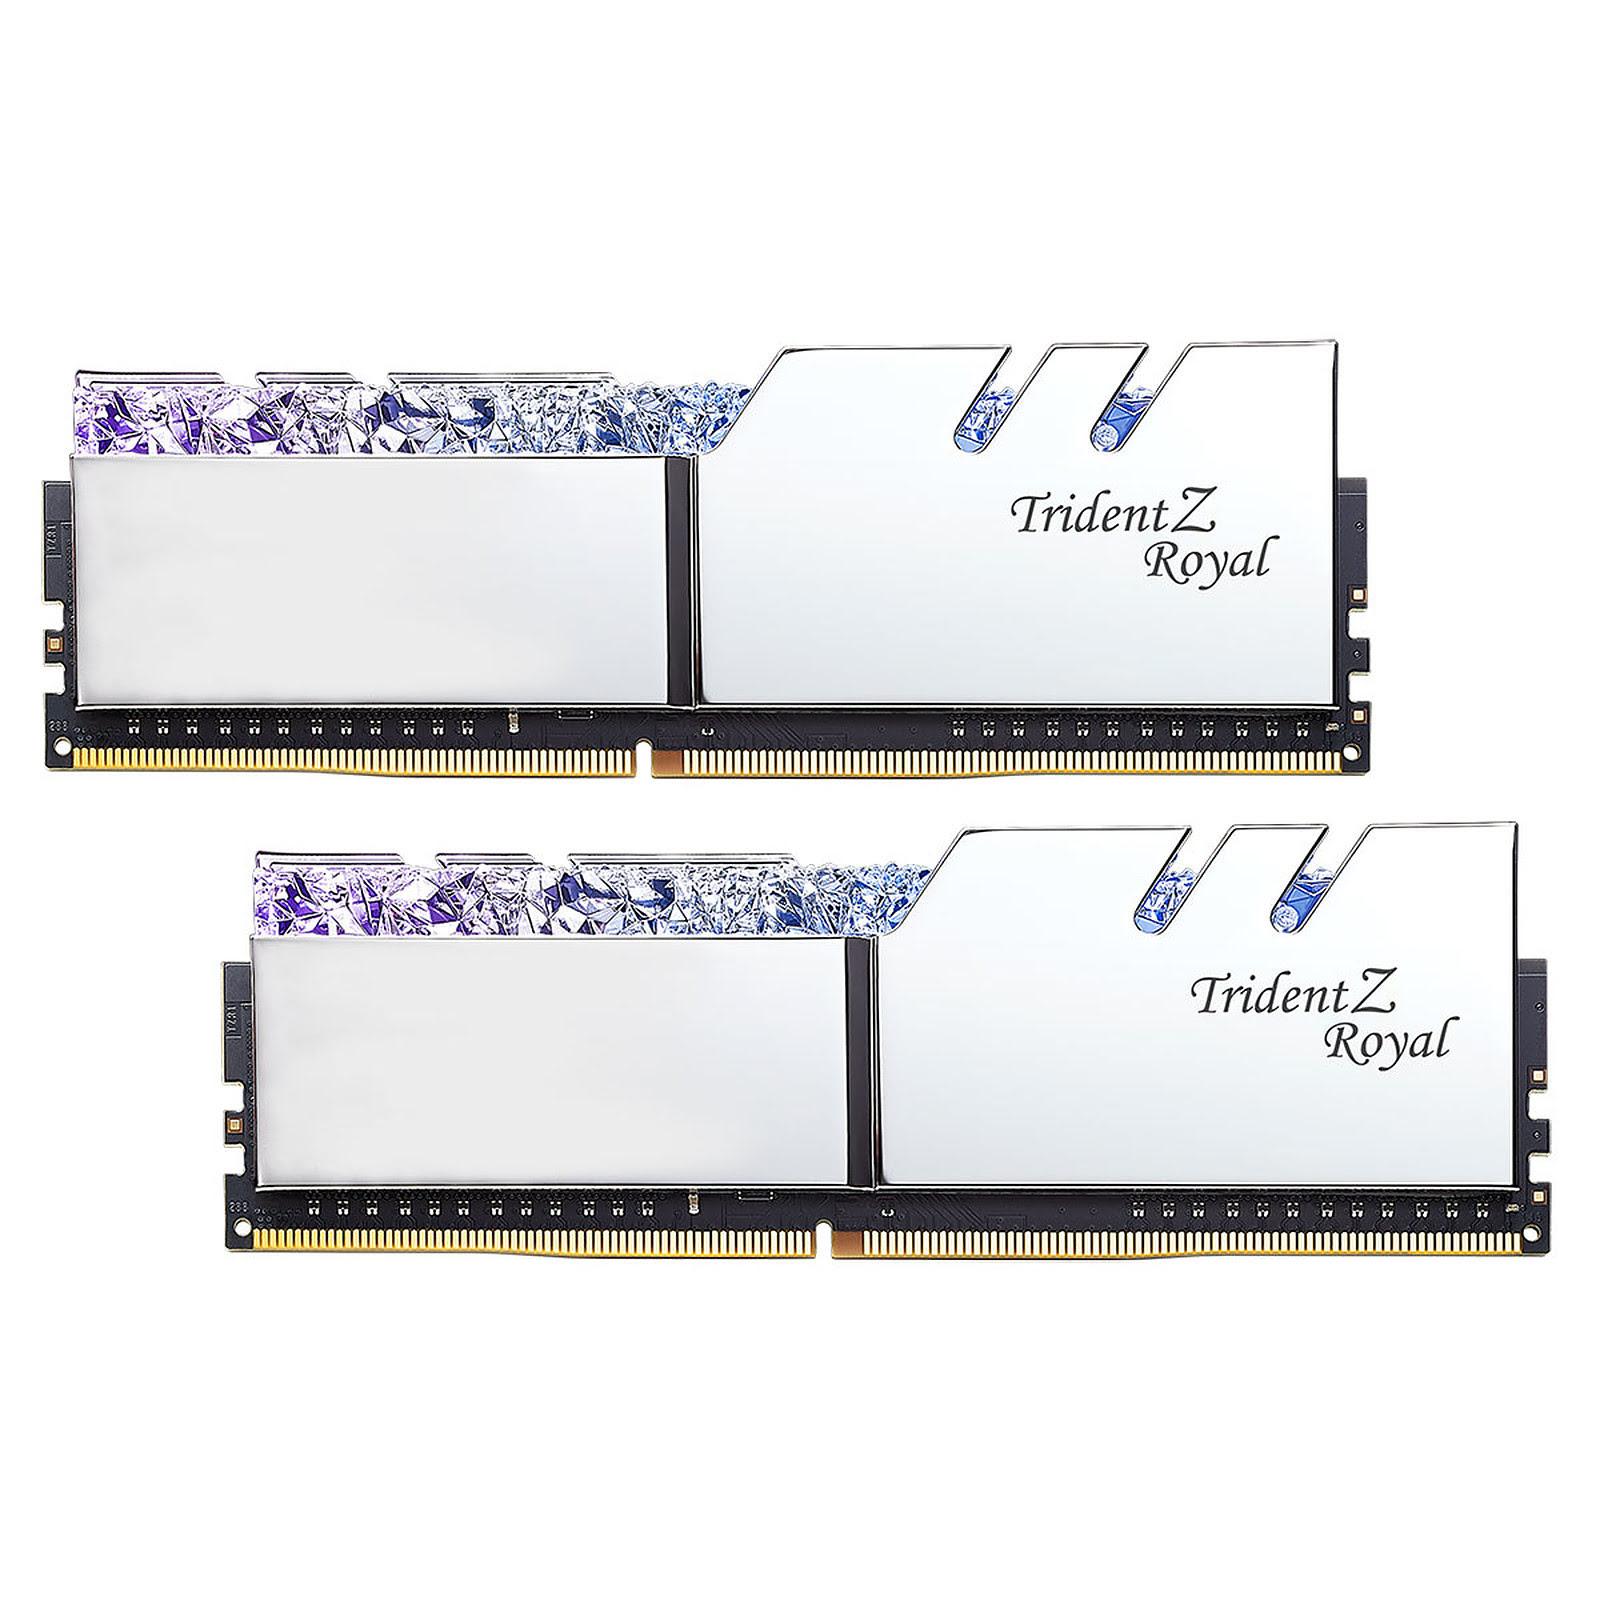 G.Skill Trident Z Royal SILVER  32Go DDR4 3000MHz PC24000 - Mémoire PC G.Skill sur Cybertek.fr - 0